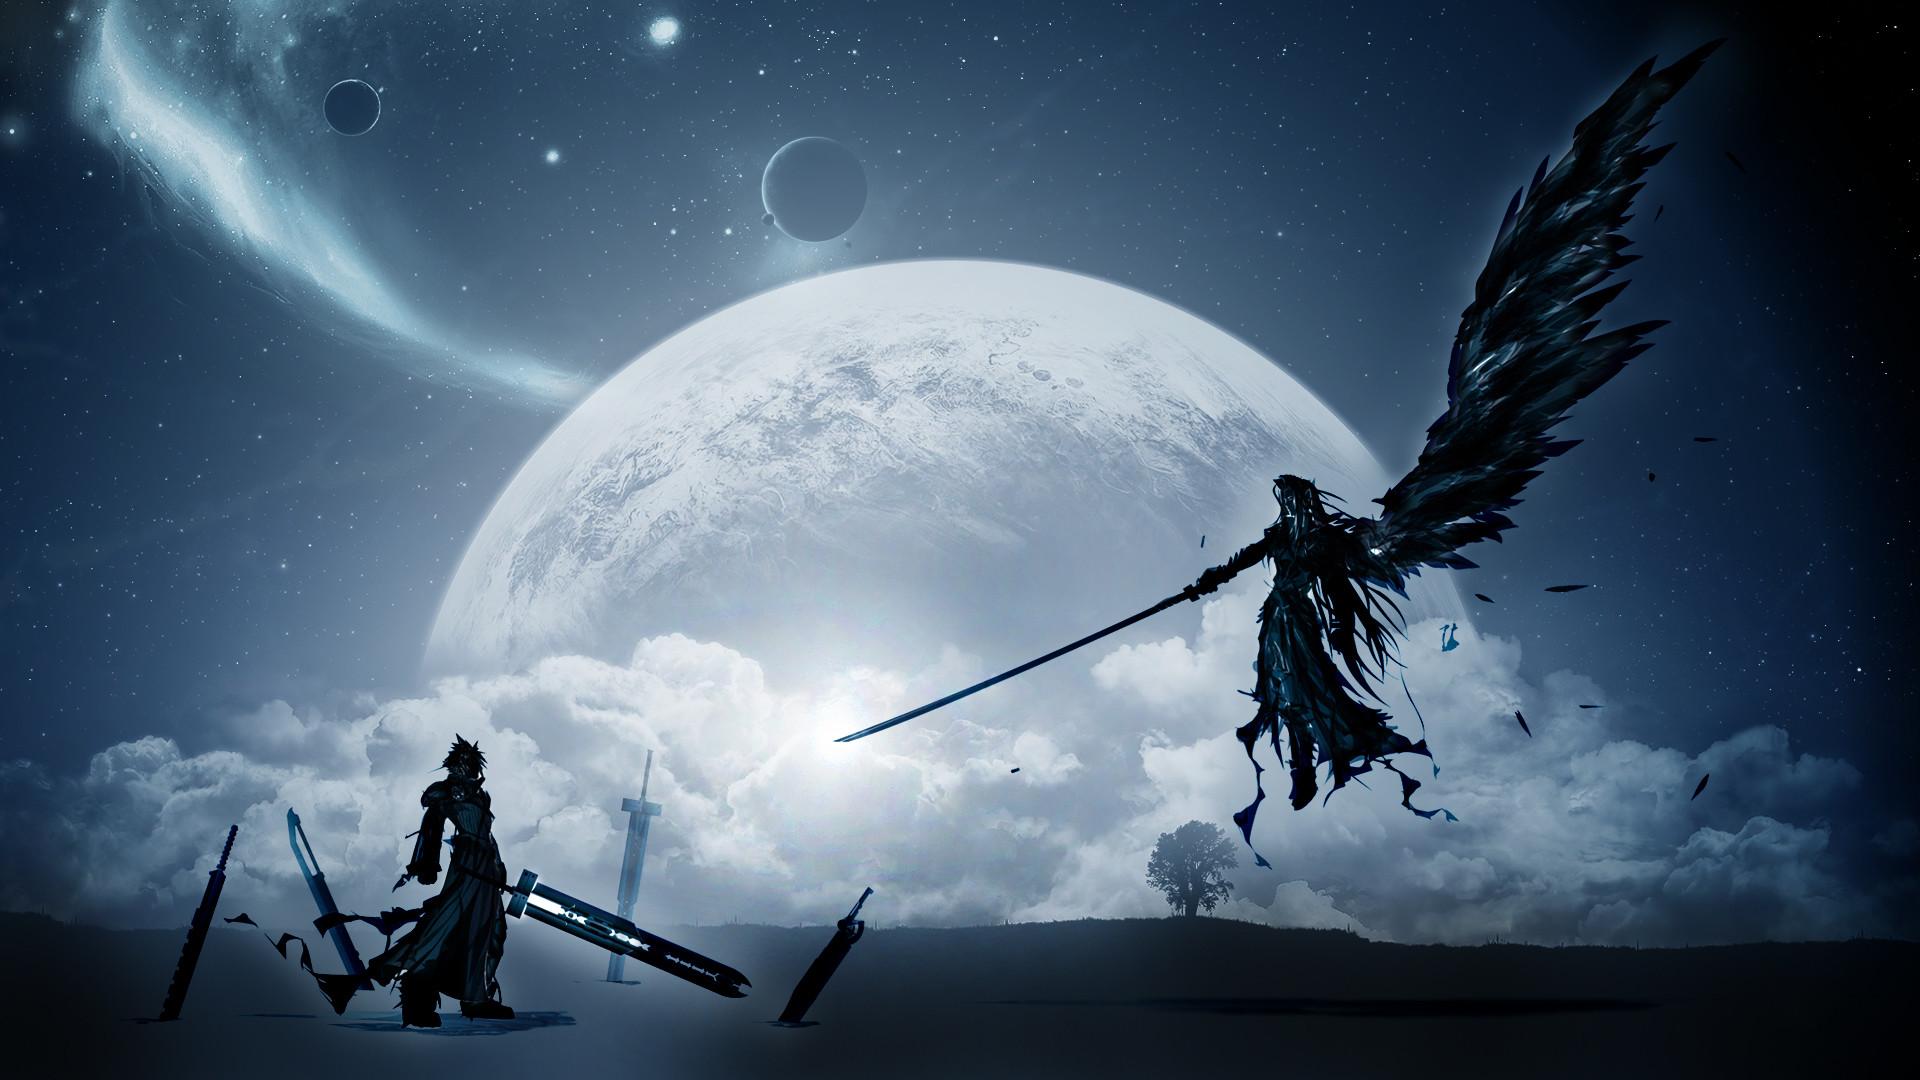 Final Fantasy Full HD Live Wallpaper – DSC42 Screenshot